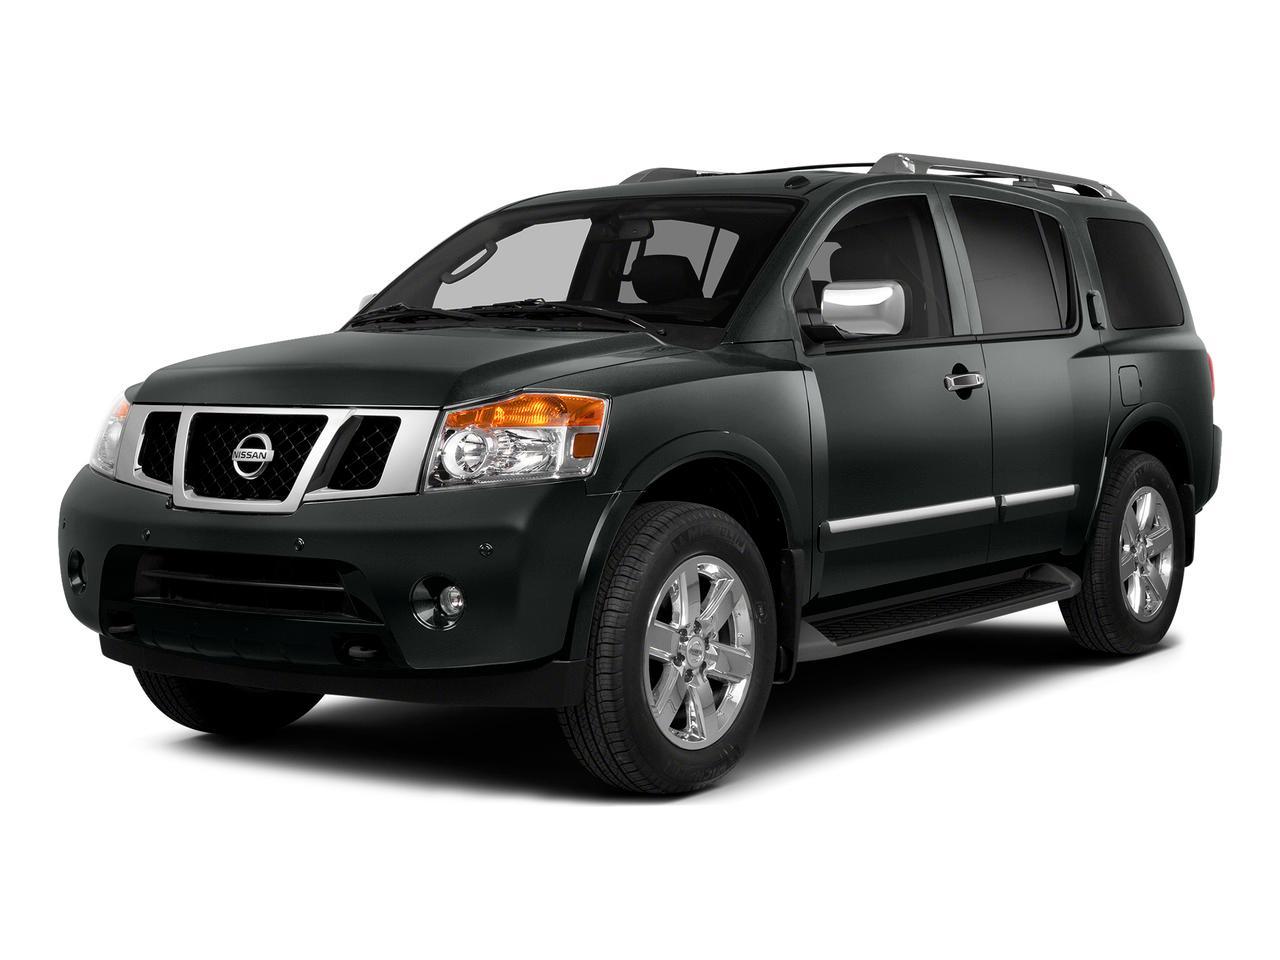 2015 Nissan Armada Vehicle Photo in Temple, TX 76502